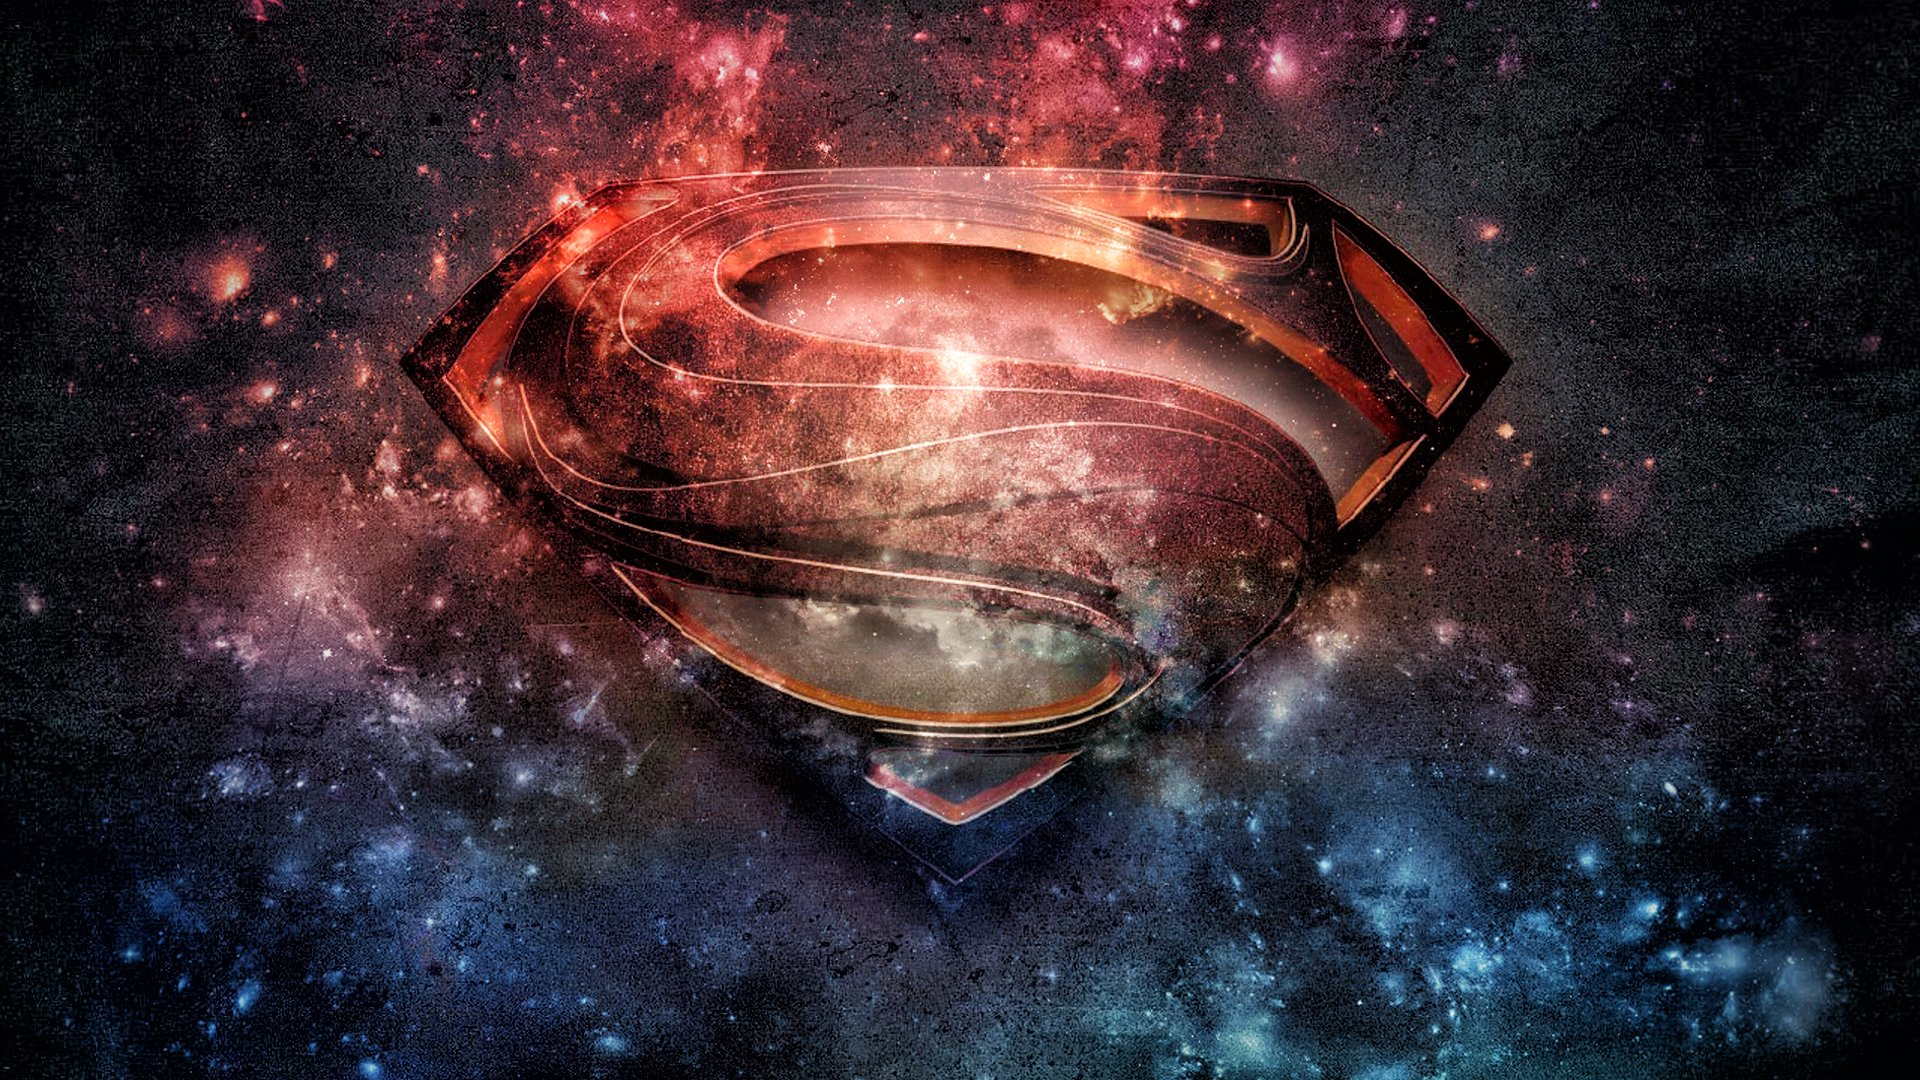 logo emblem supergirl hero superhero poster superman